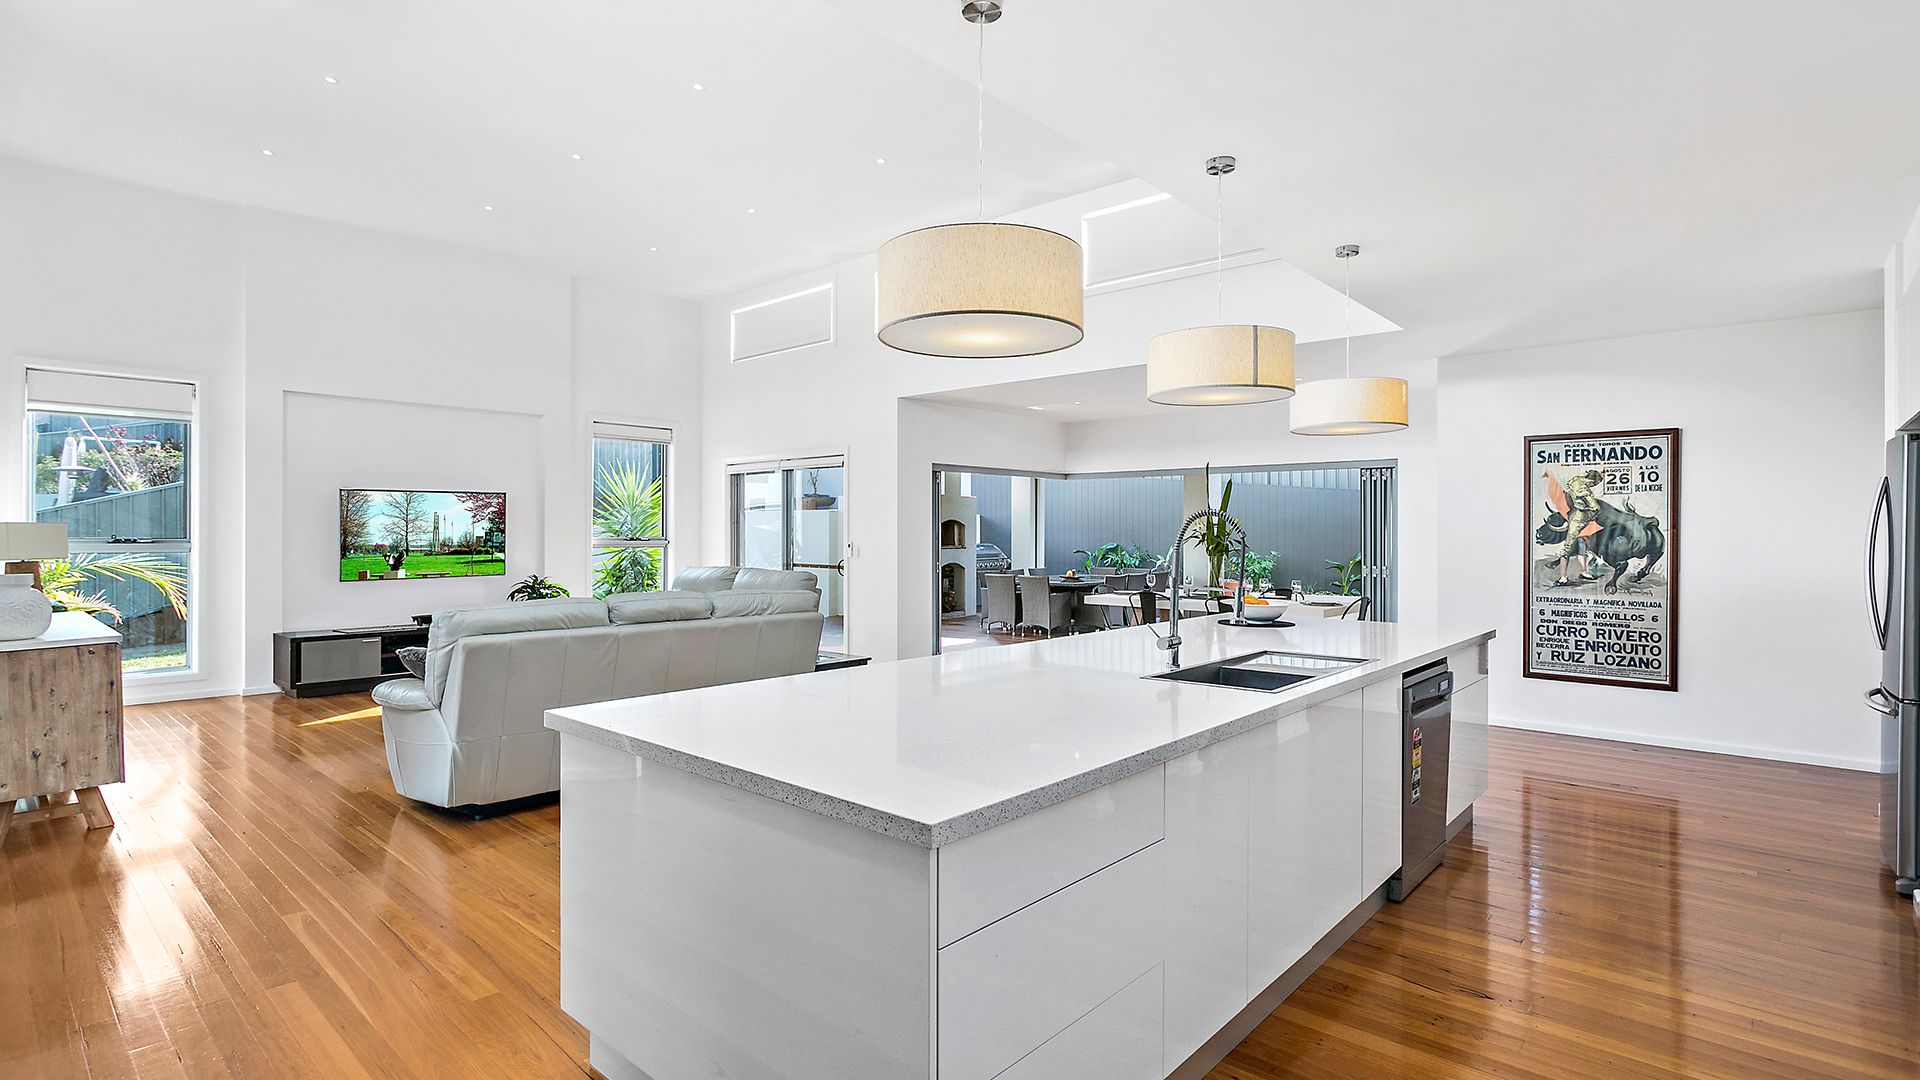 126 Whittaker Street, Flinders NSW 2529, Image 1